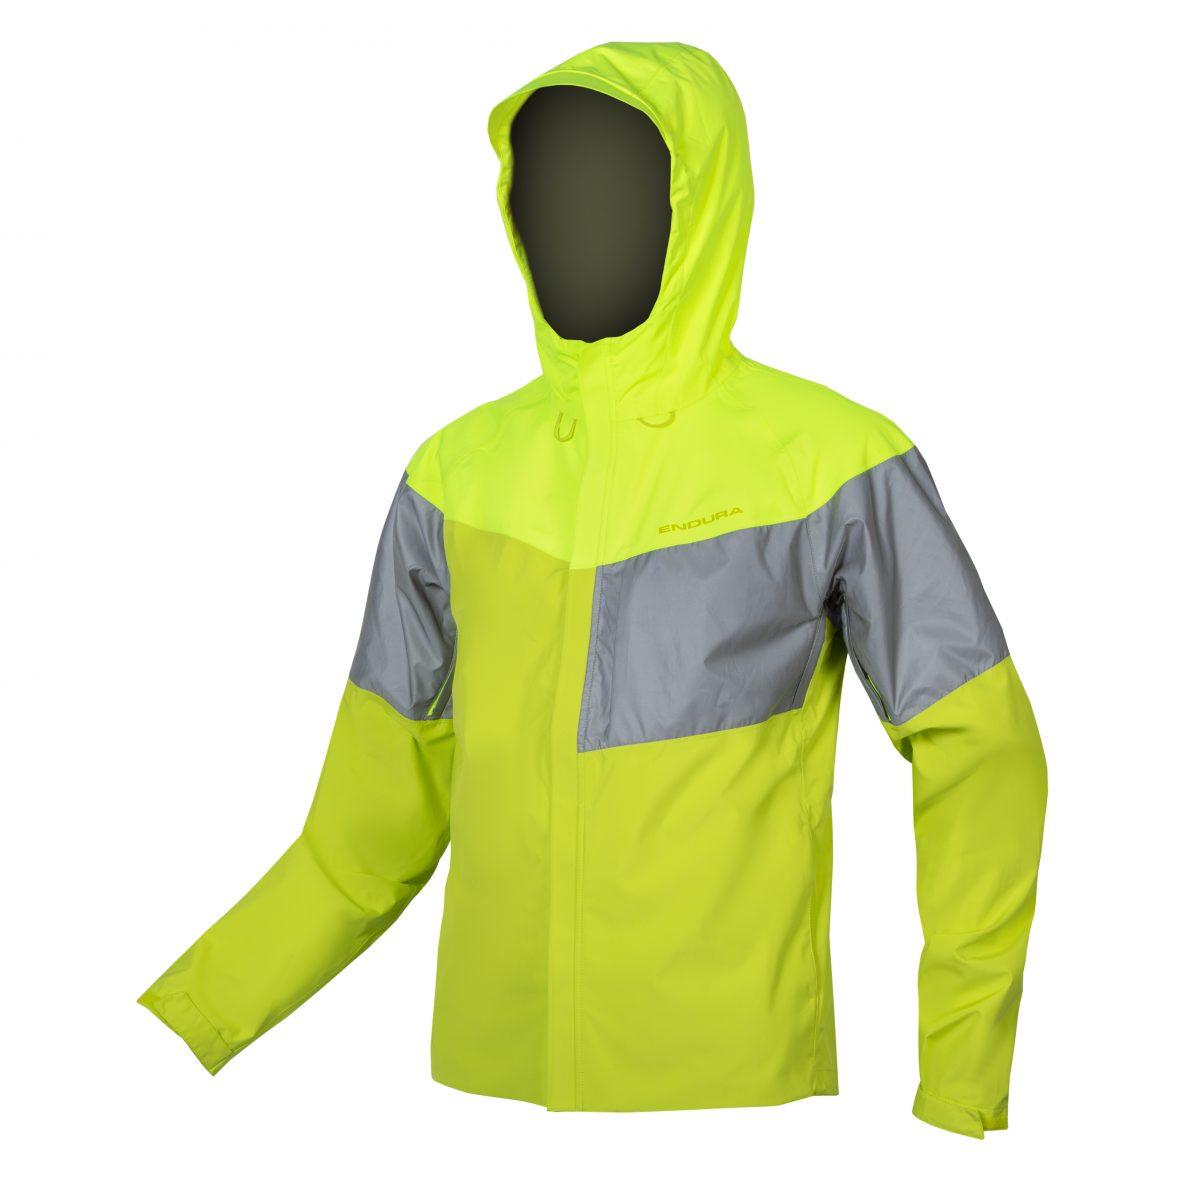 Urban Luminite 3 in 1 Jacket